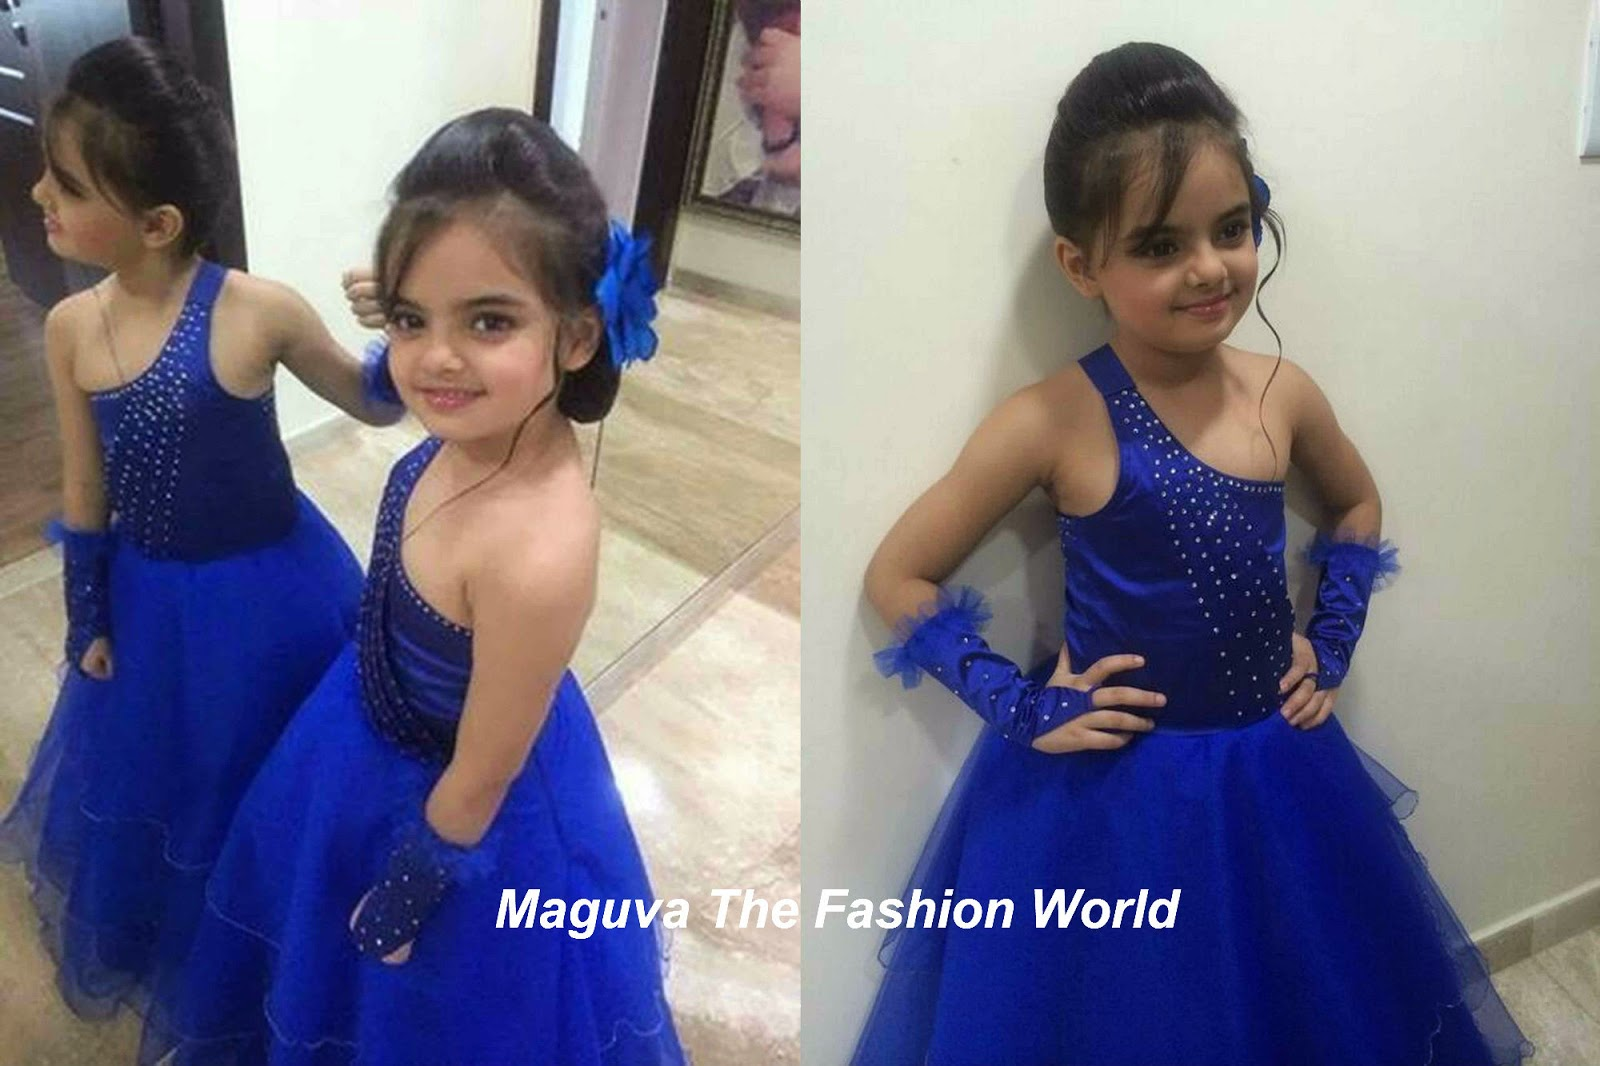 Ruhanika dhawan in bright blue dress maguva the fashion world